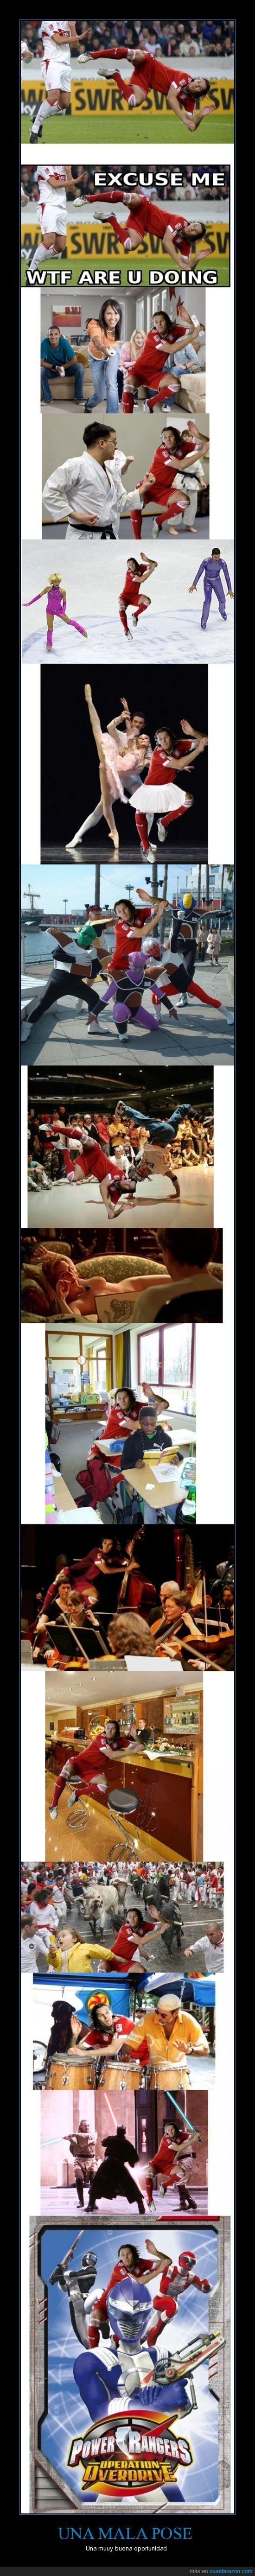 futbol,niña del pompero,photoshop,pose